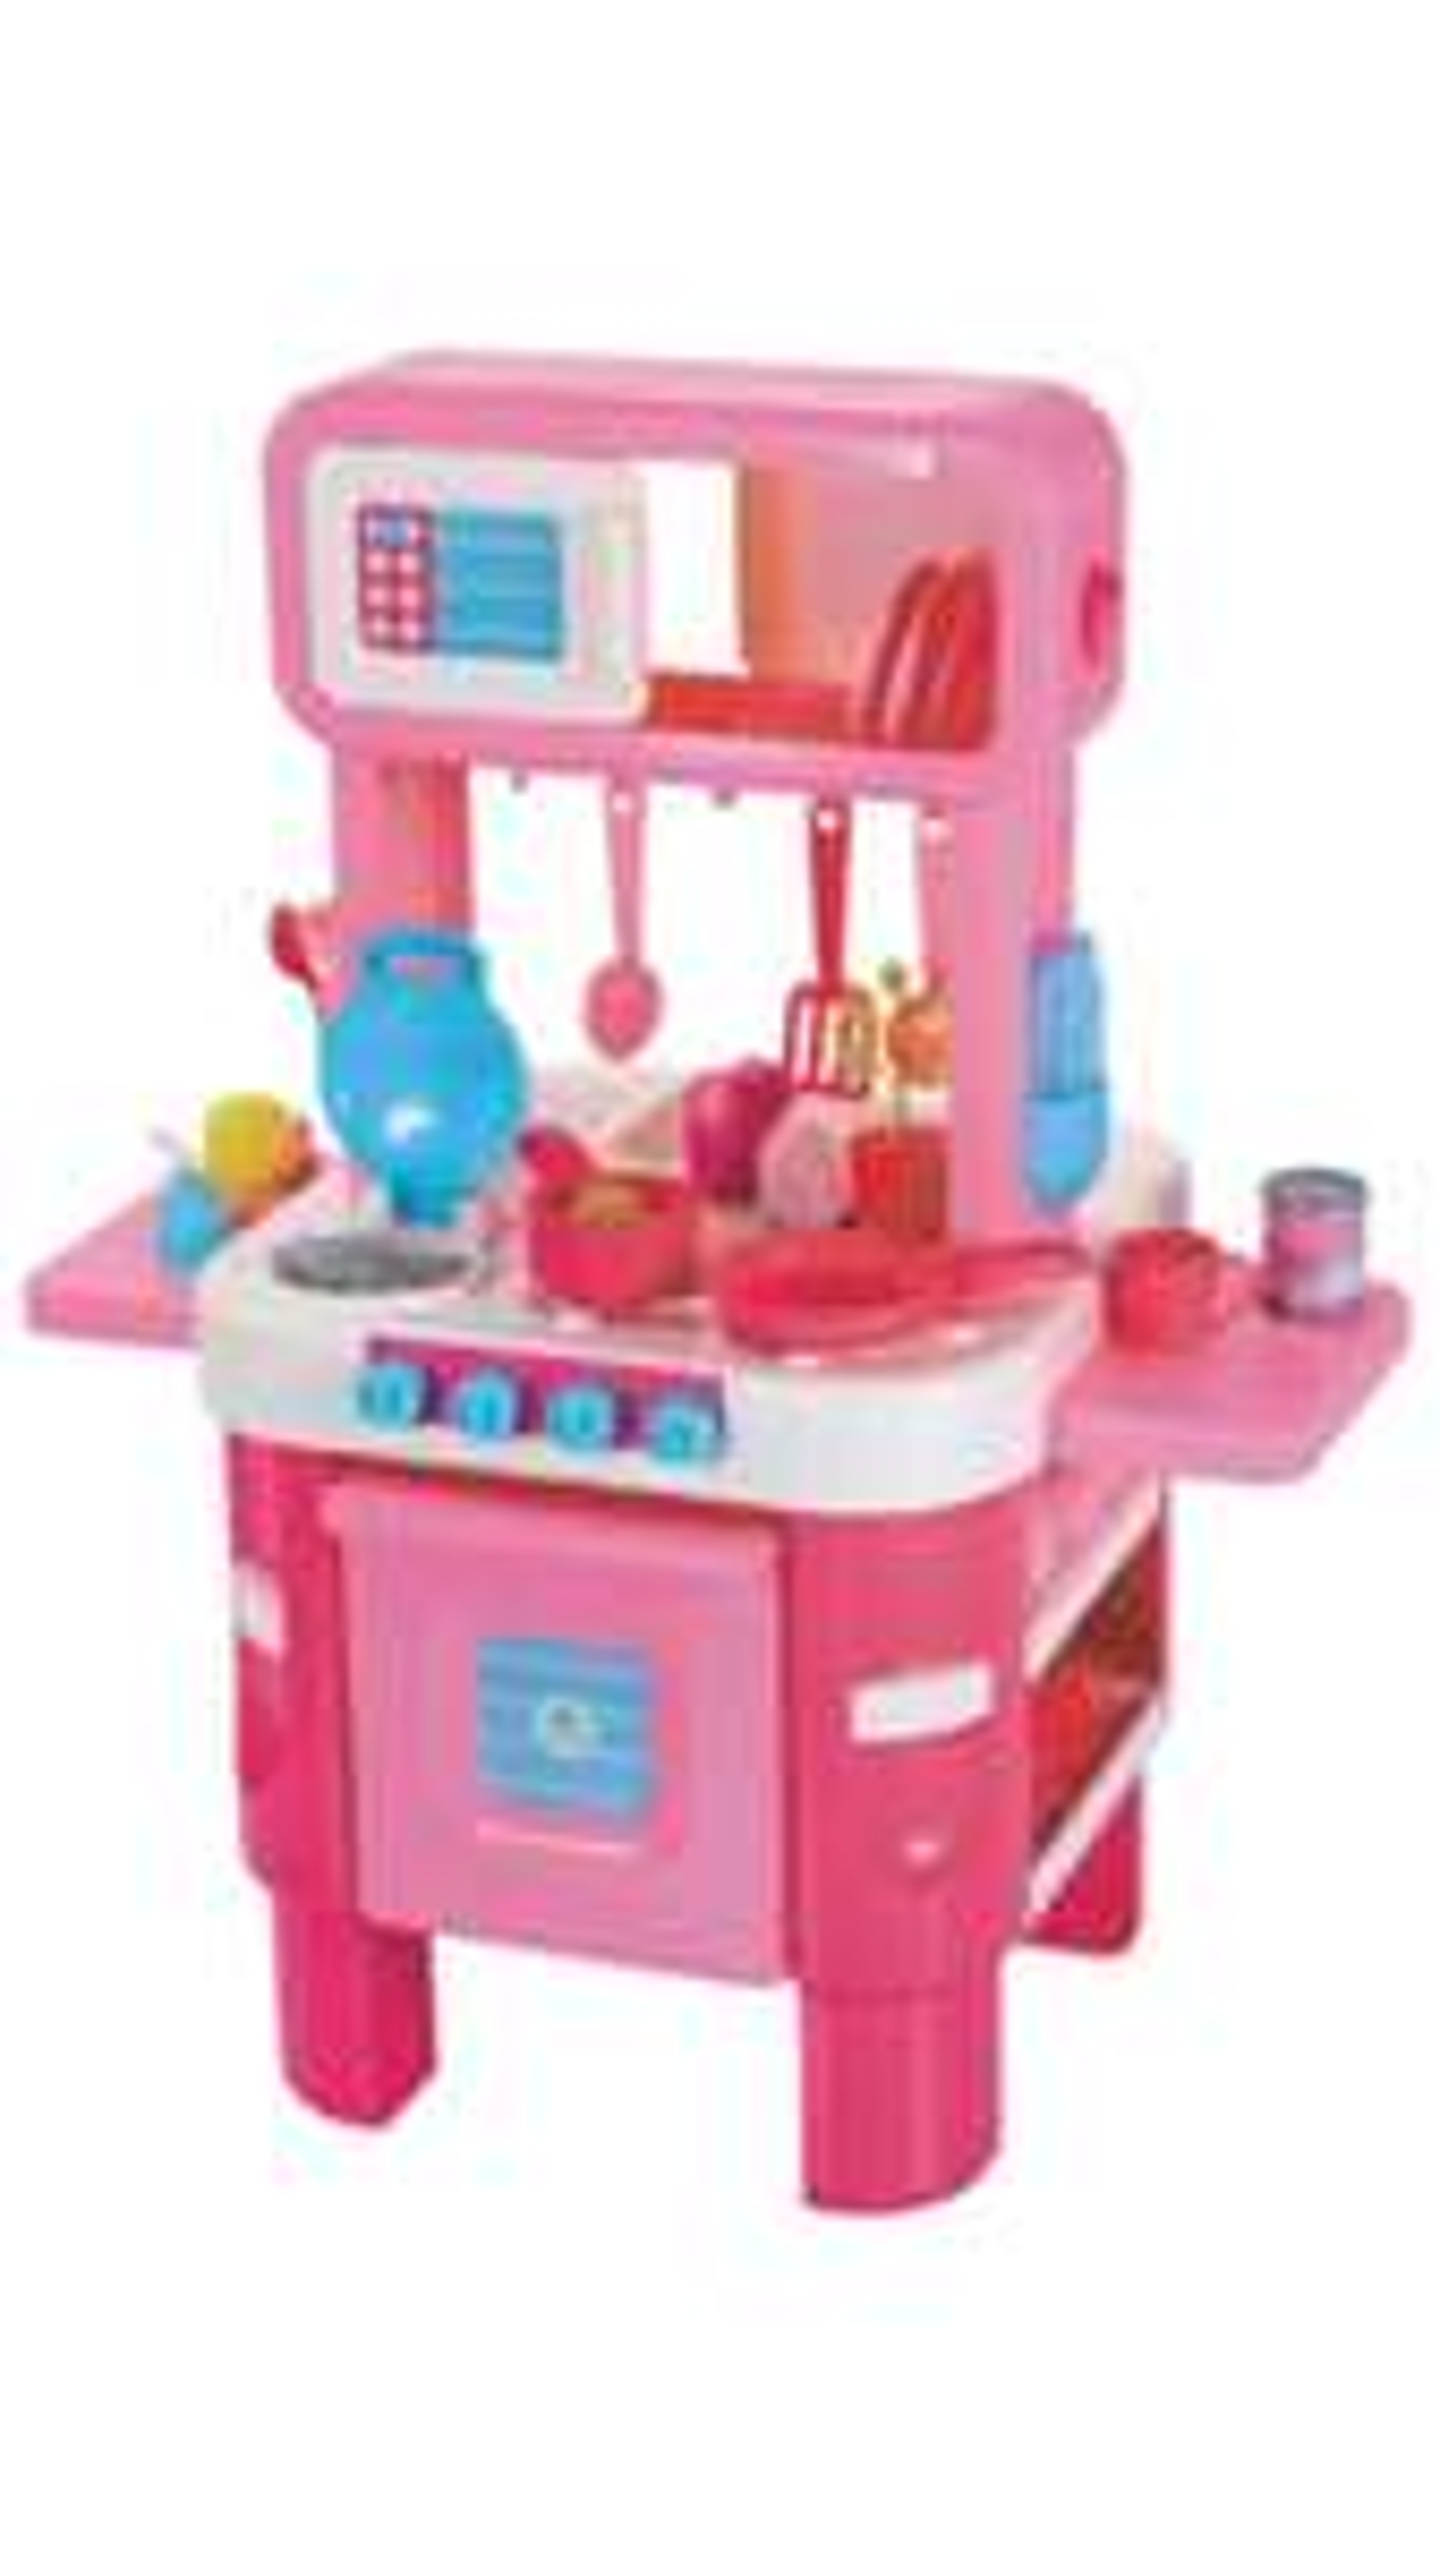 Elc cooks pink kitchen £24 @ ELC